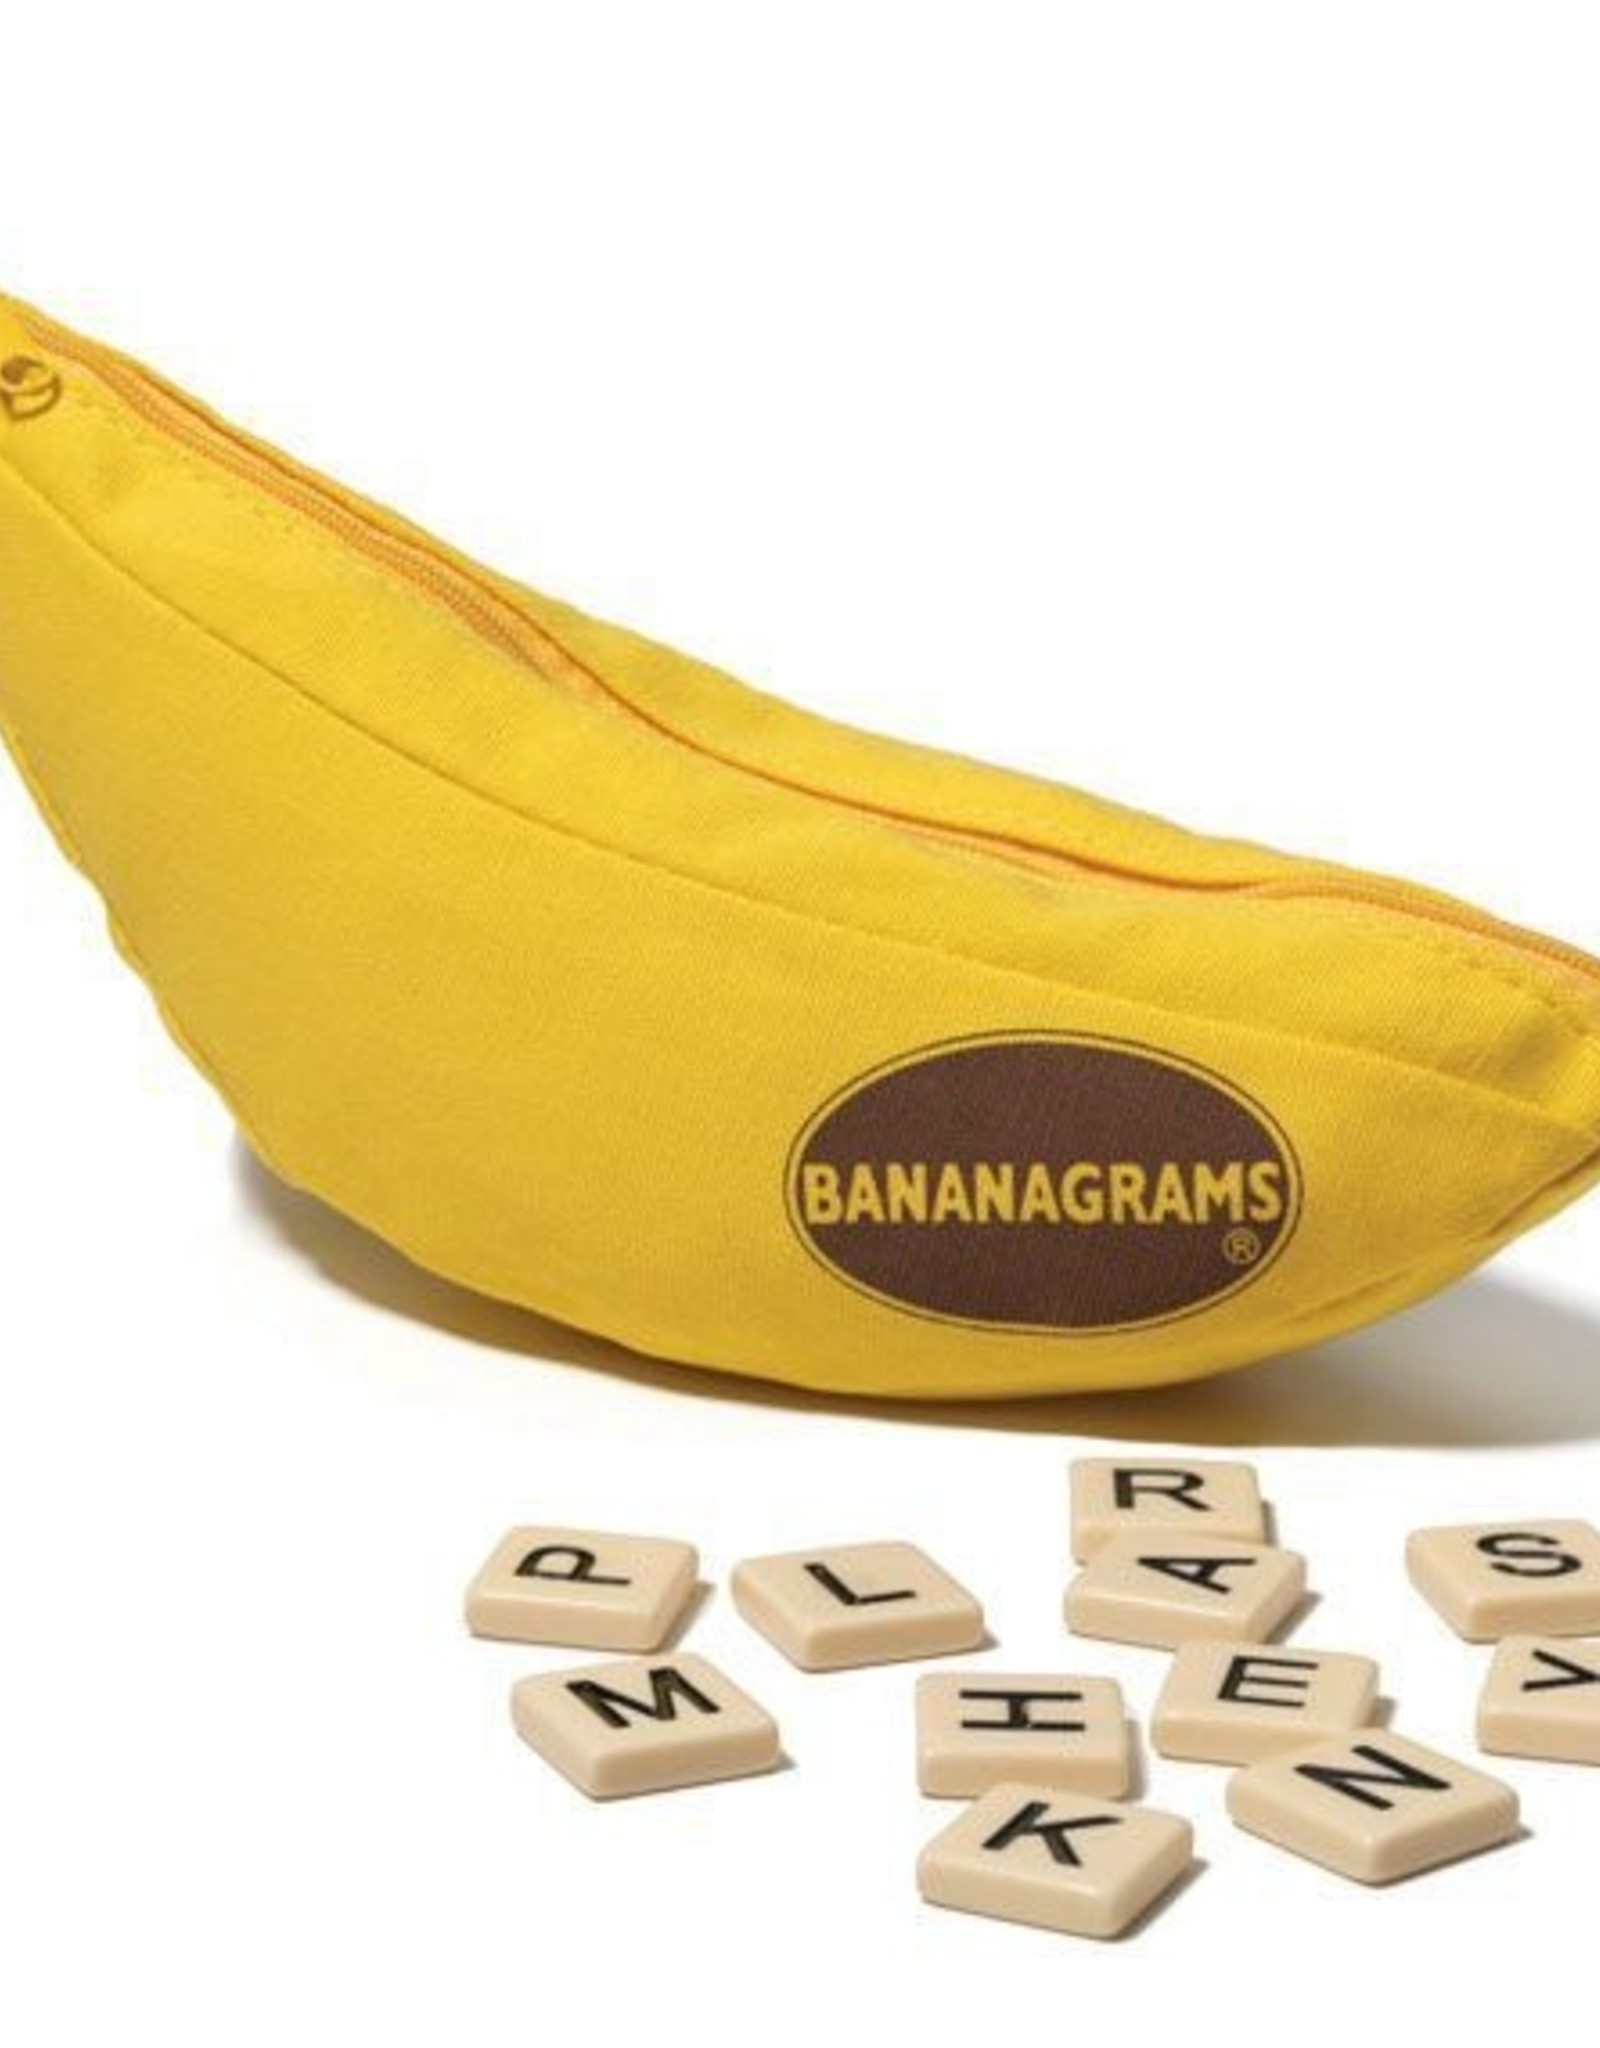 bananagrams.com Bananagrams